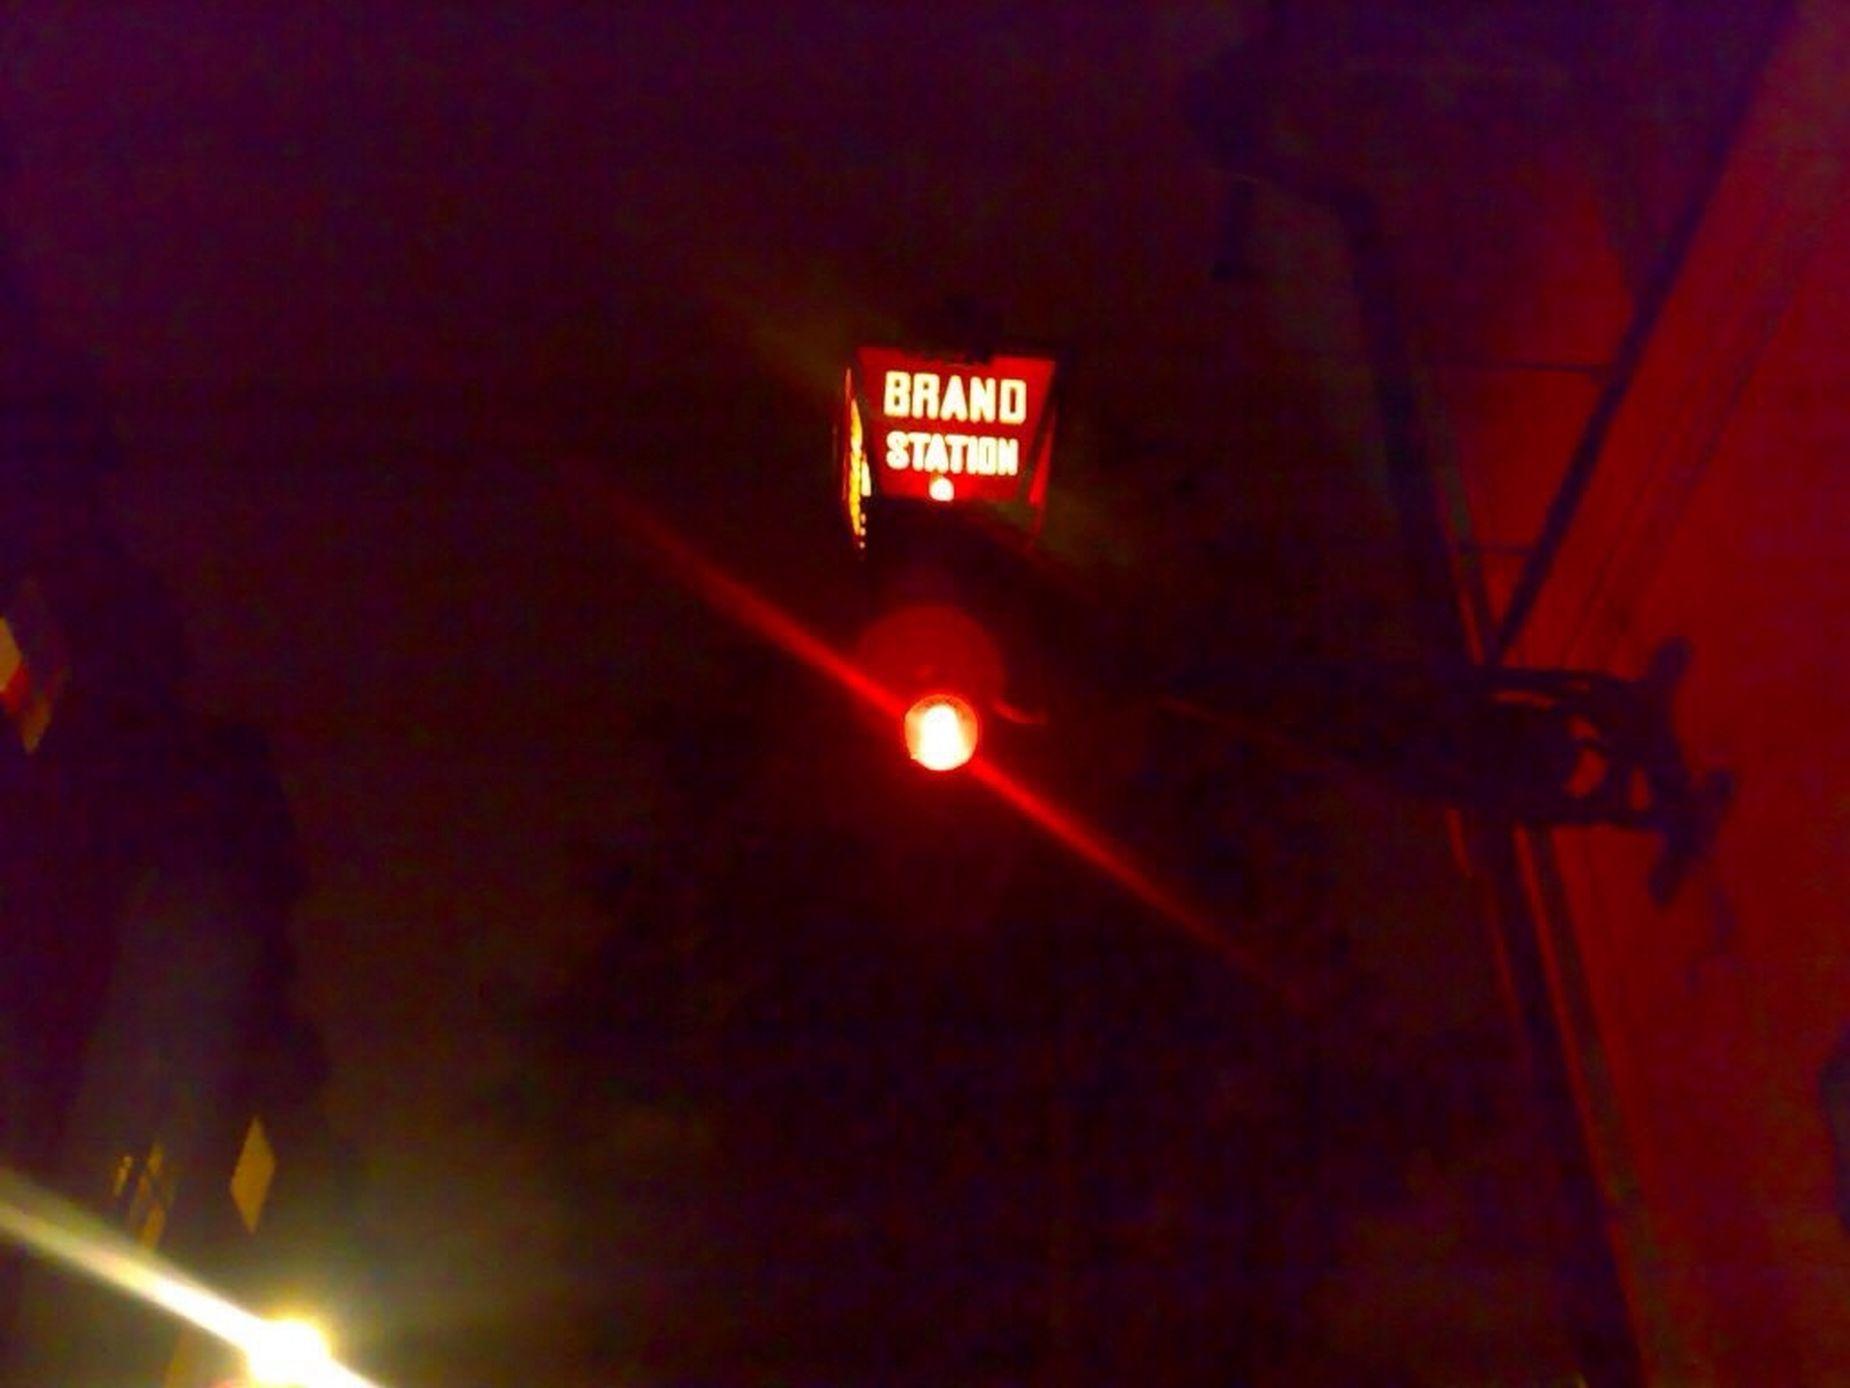 Firestation Firehouse Brandstation Night Lights